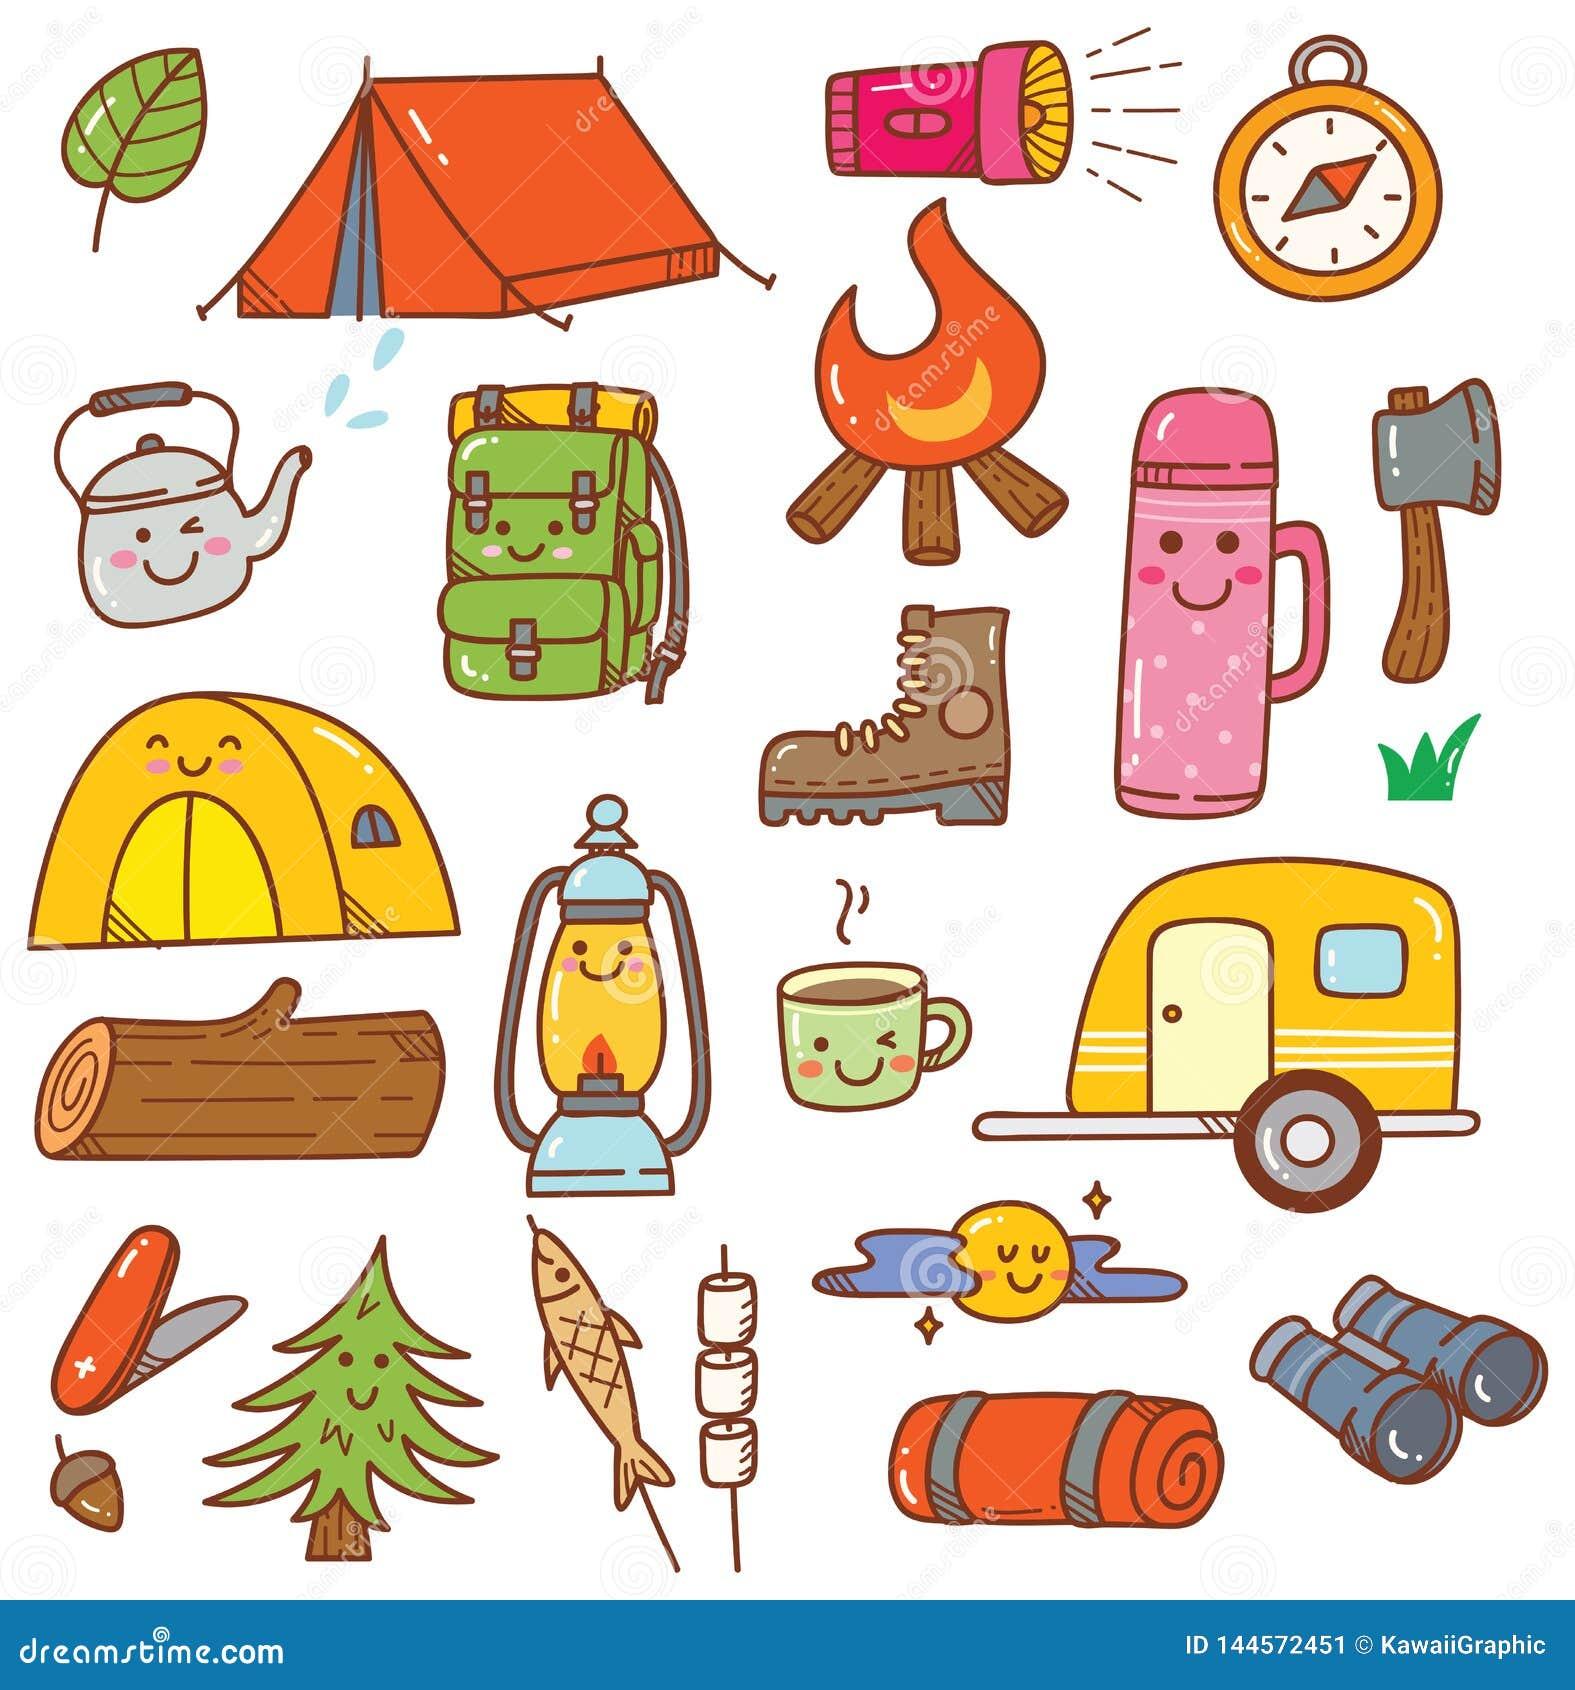 Camping Kawaii Doodle Set Isolated On White Background Stock Illustration Illustration Of Illustration Doodles 144572451